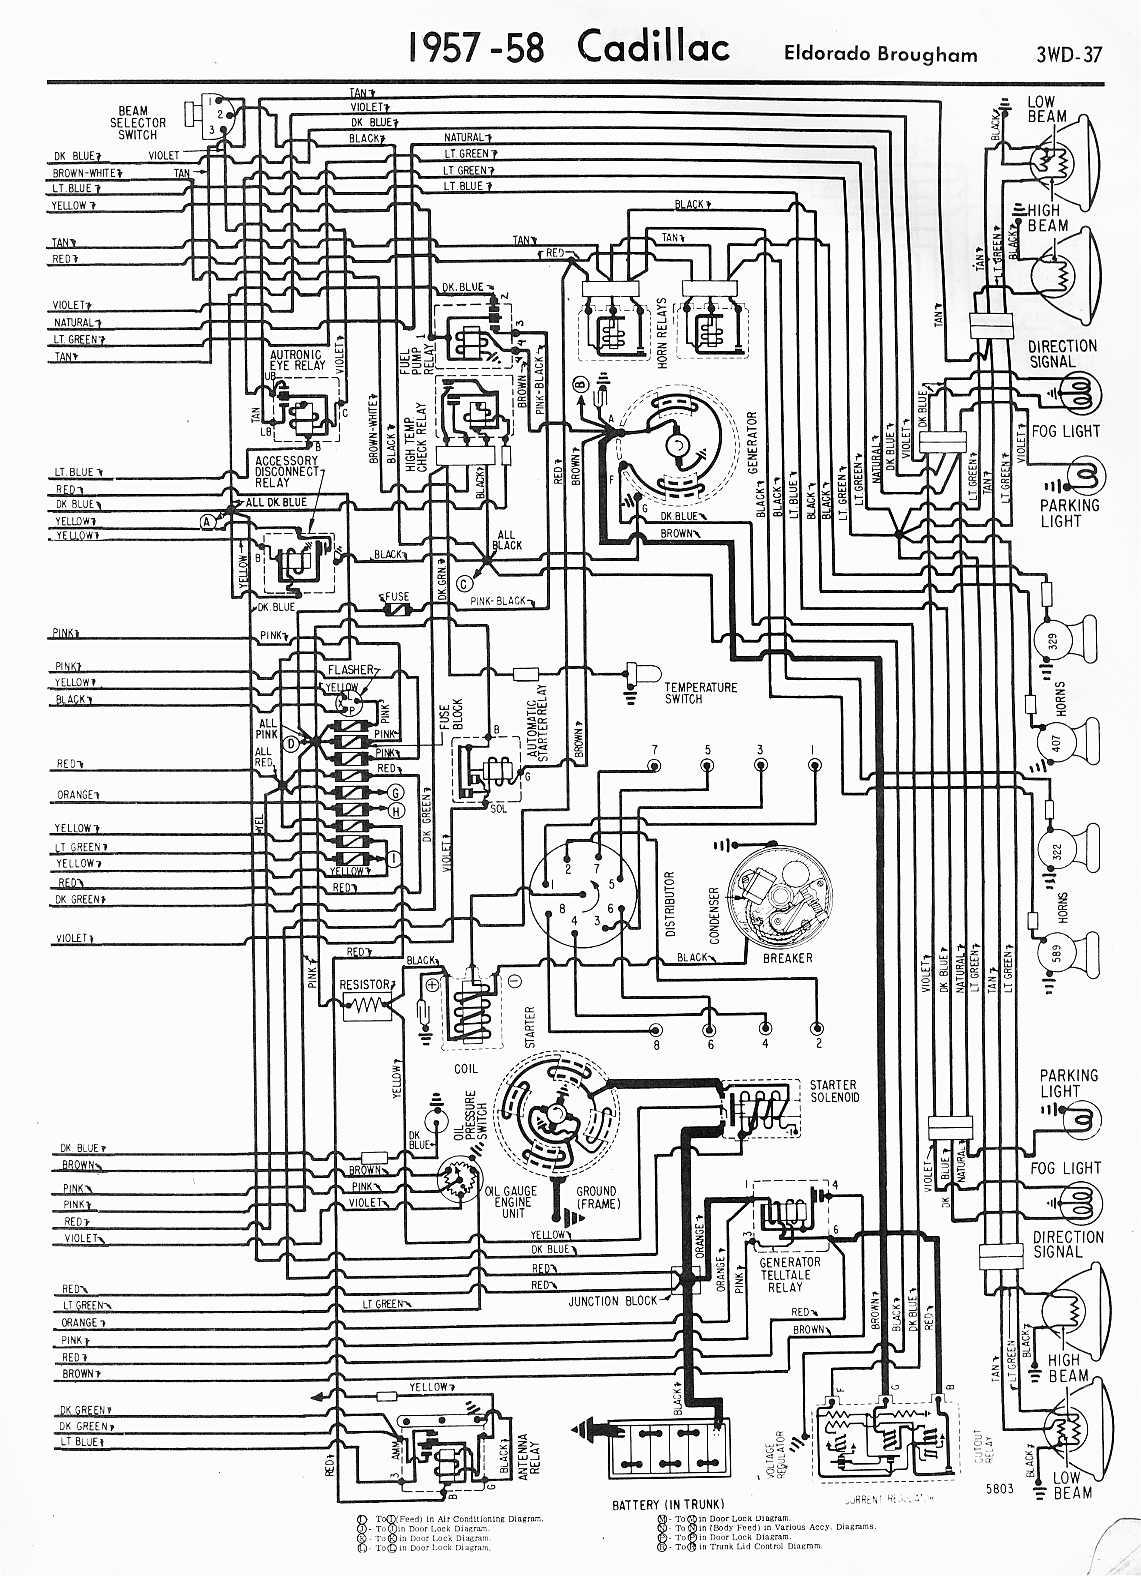 Cadillac Eldorado Wiring Harness Diagram - wiring diagram on ... on